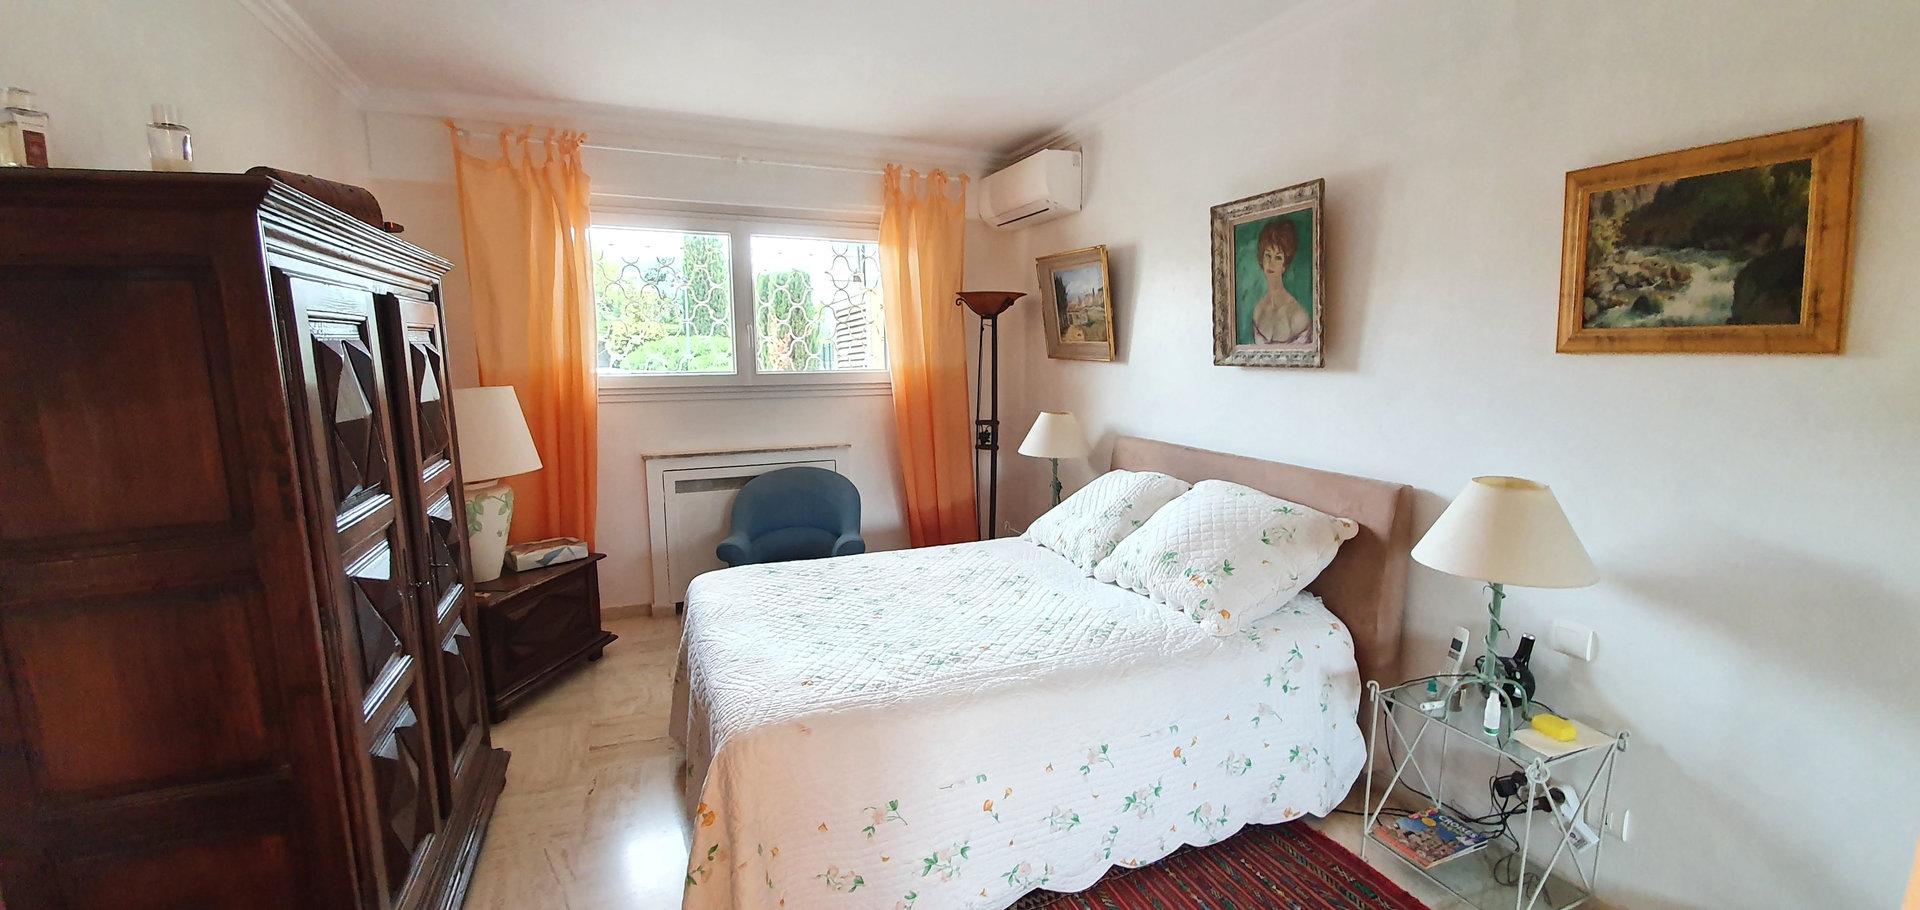 Croisette 2 bedroom